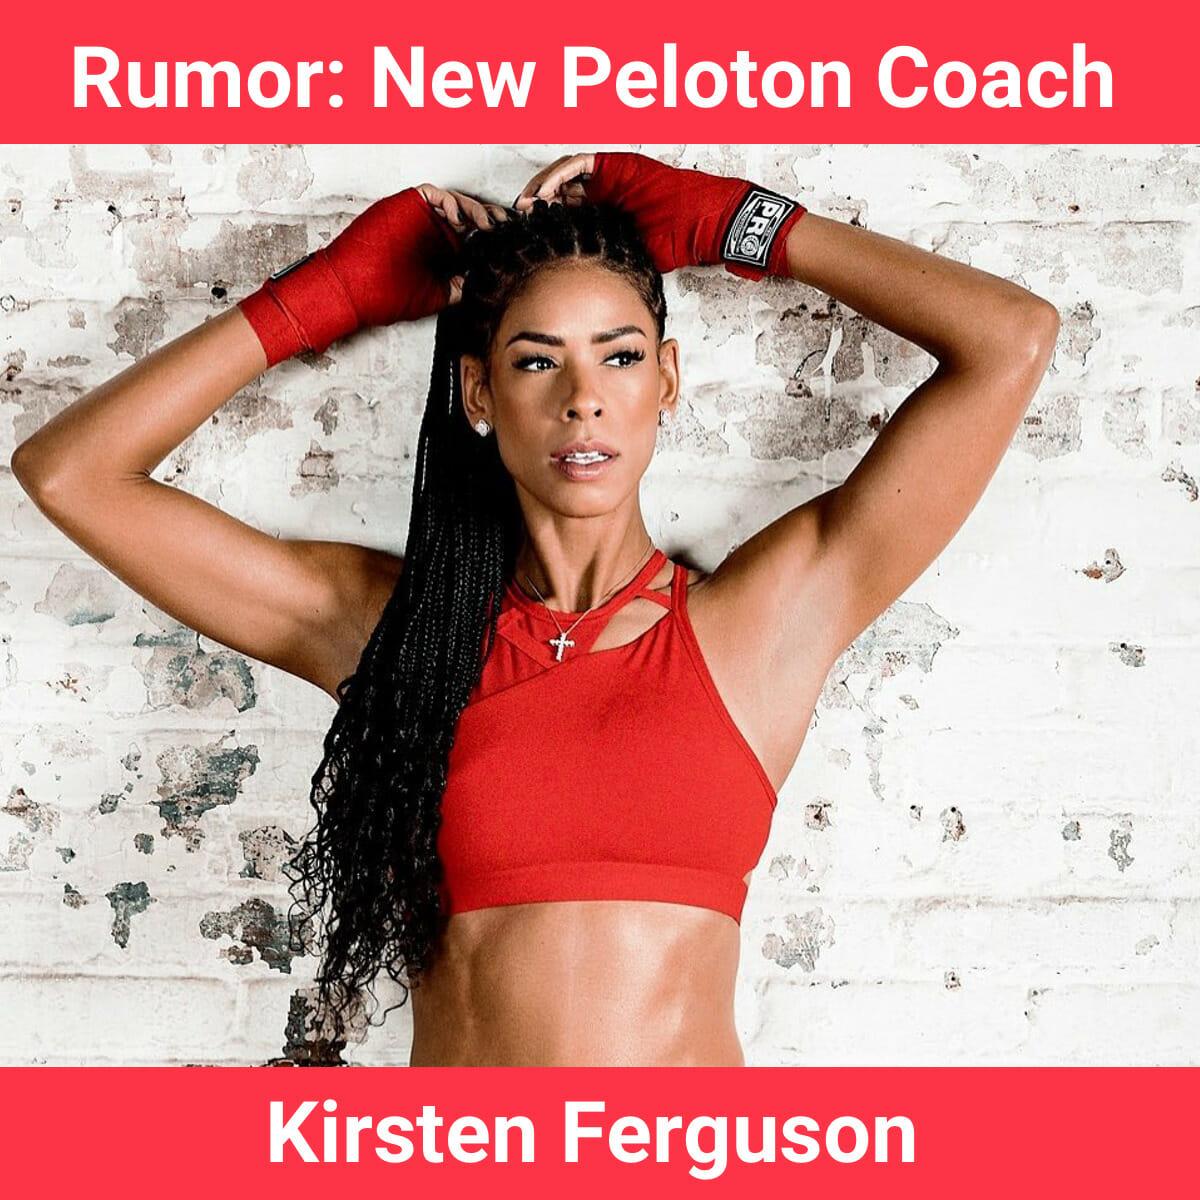 Image of rumored Peloton coach Kirsten Ferguson